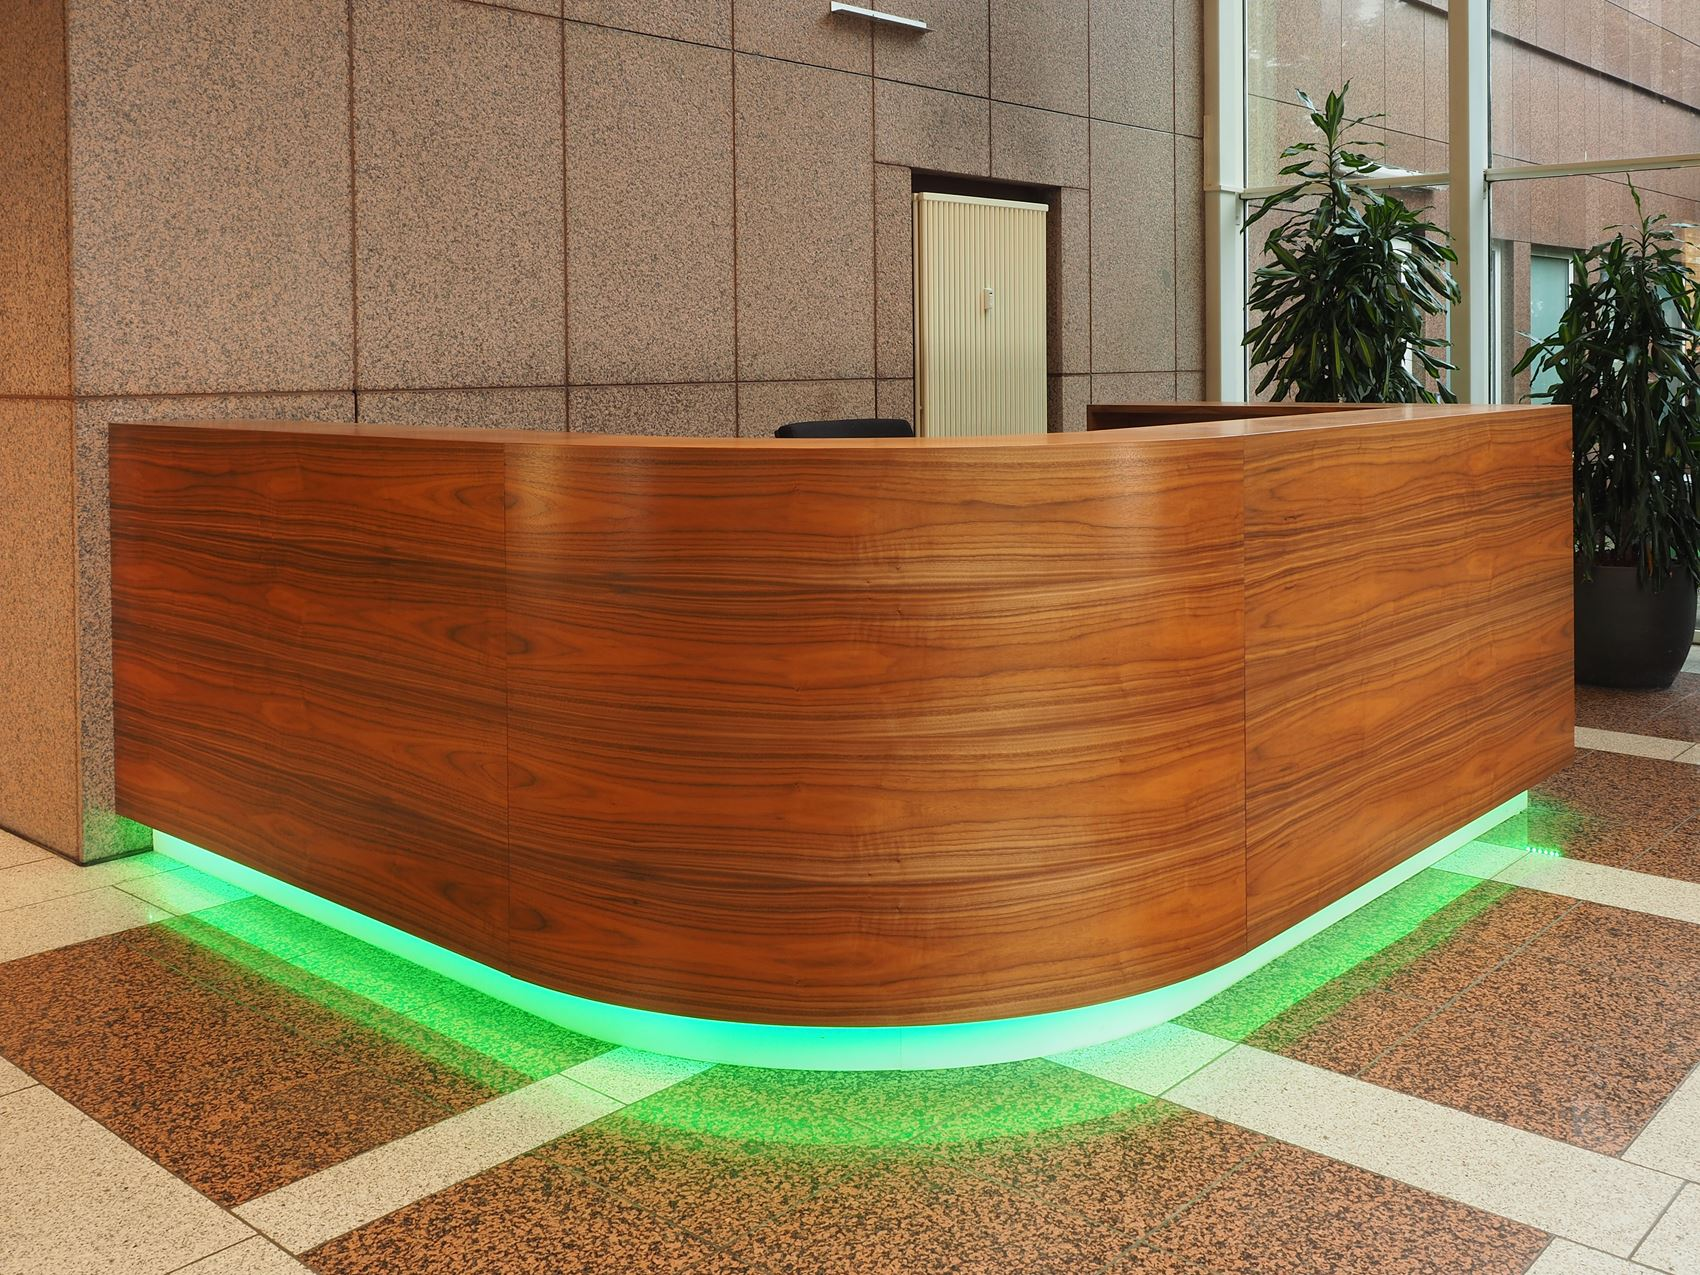 Tresen mit LED-Beleuchtung